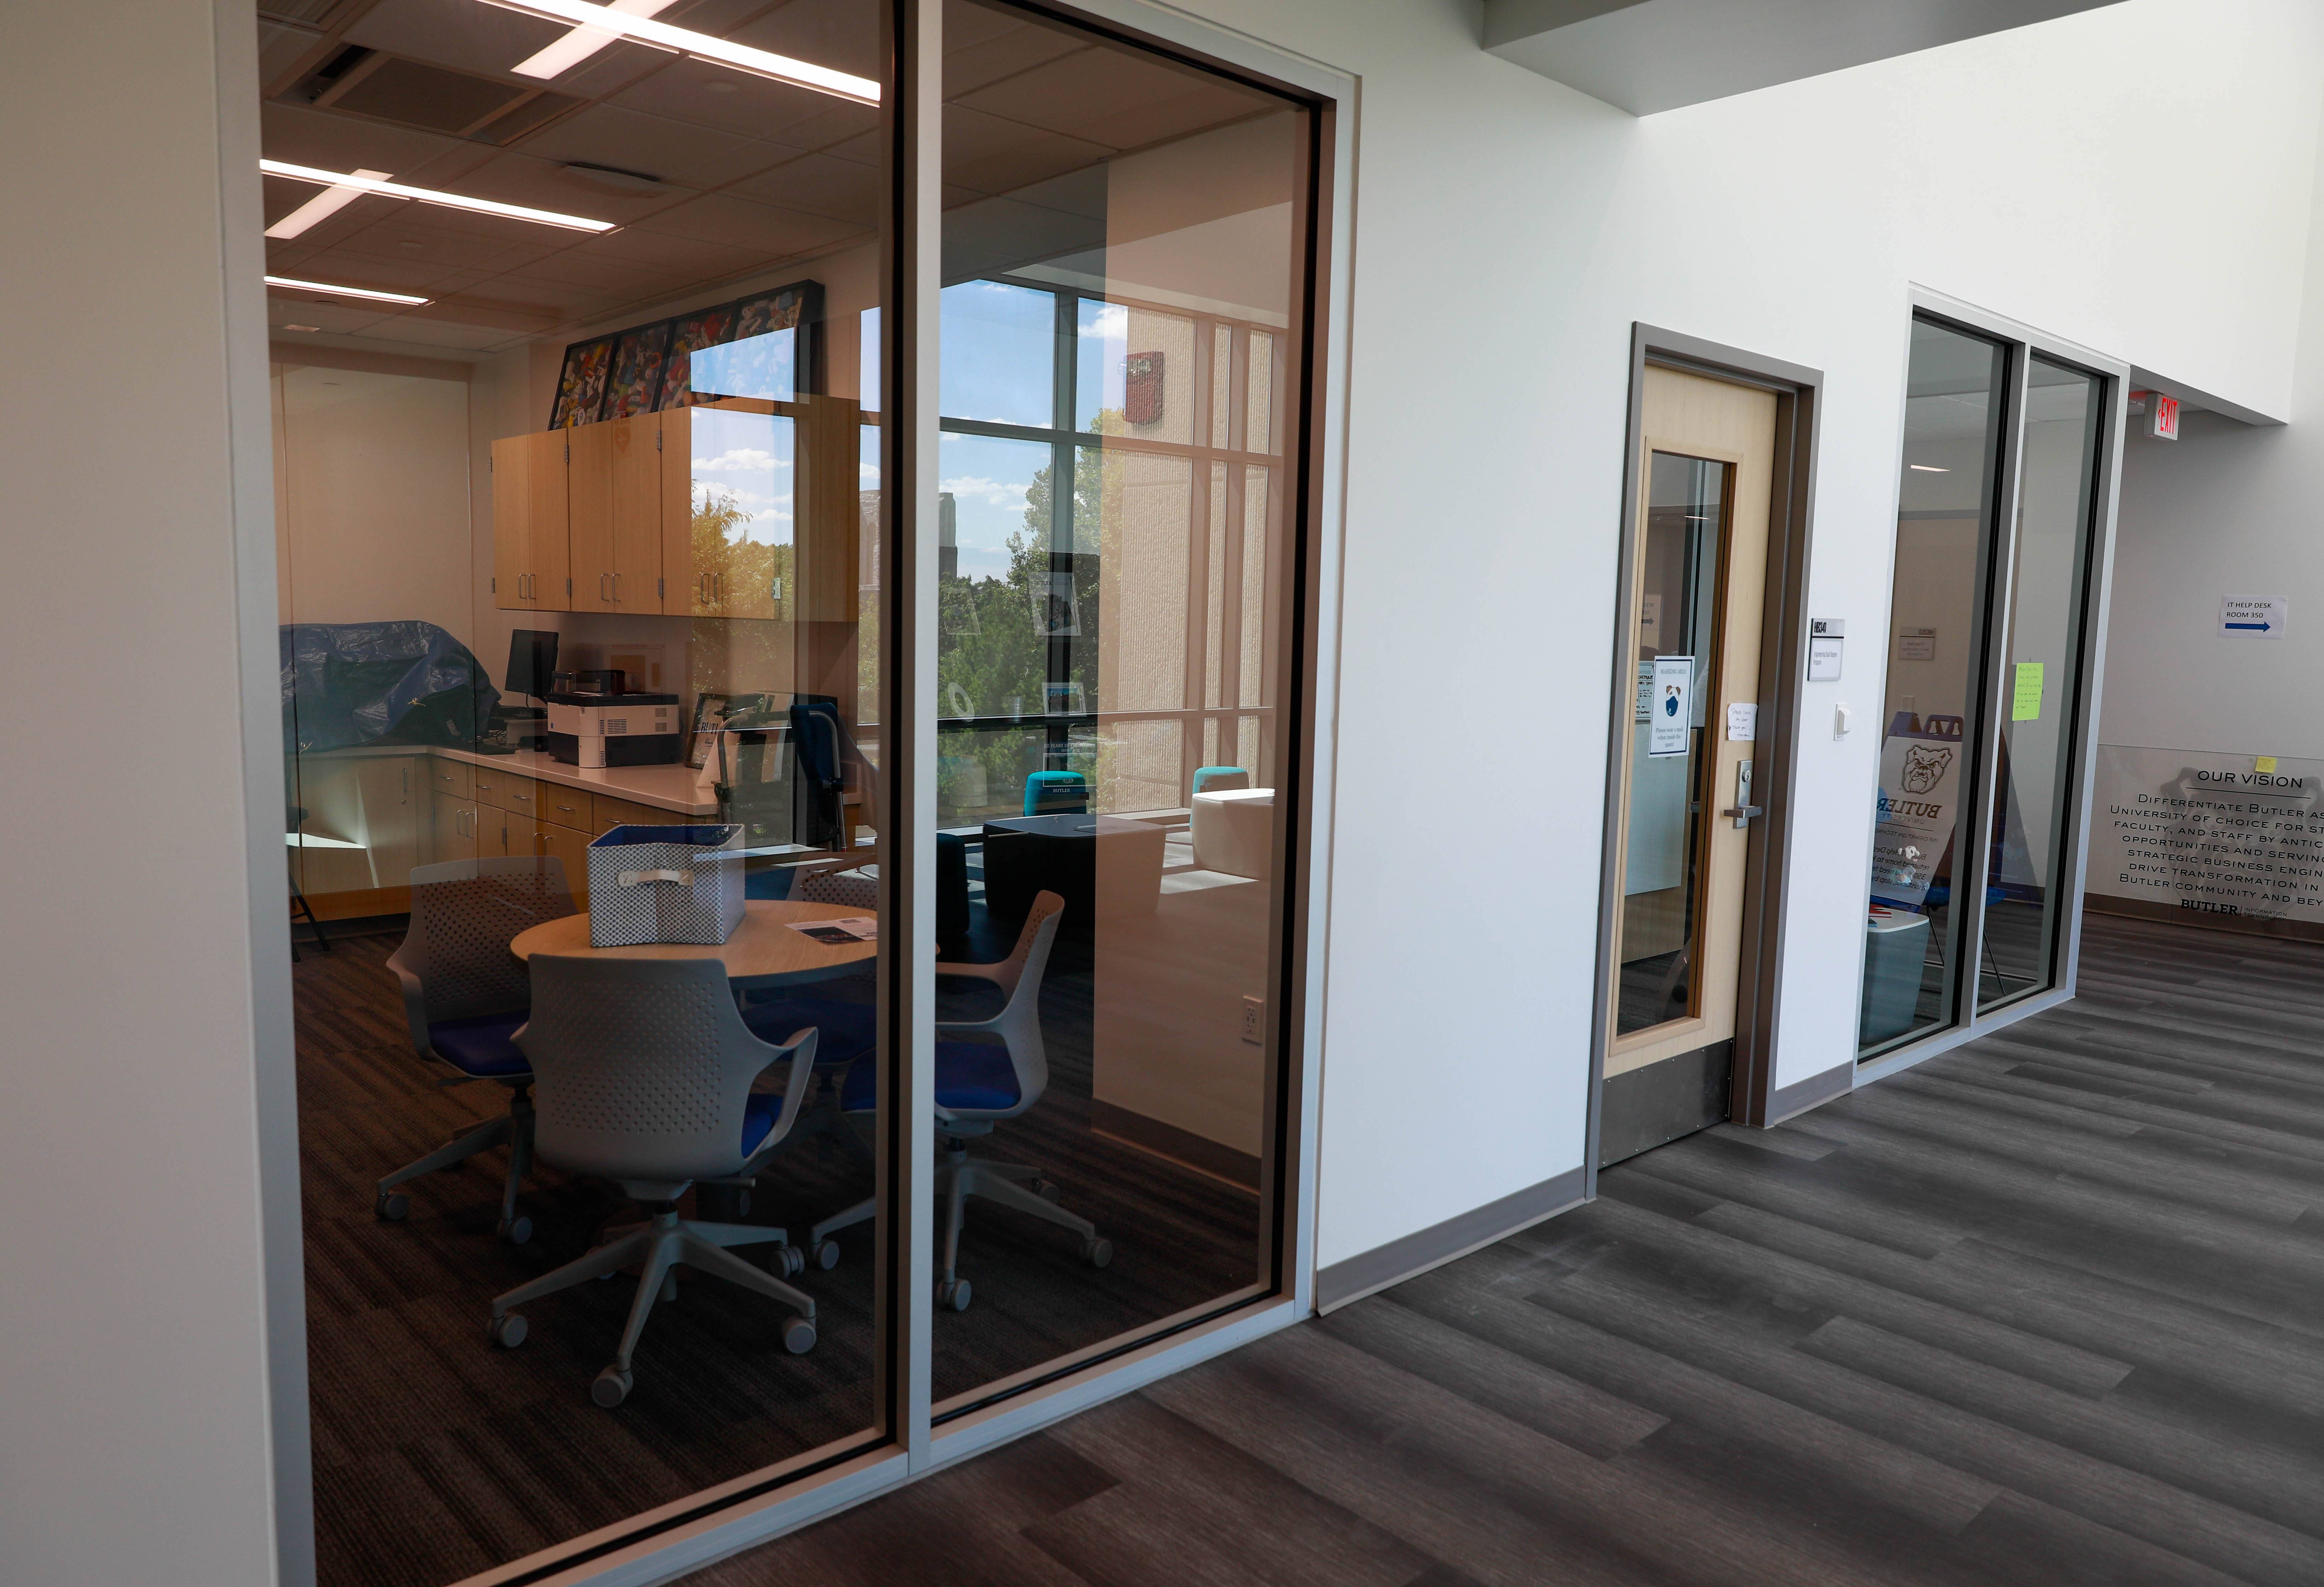 EDDP space, Butler University Holcomb Building